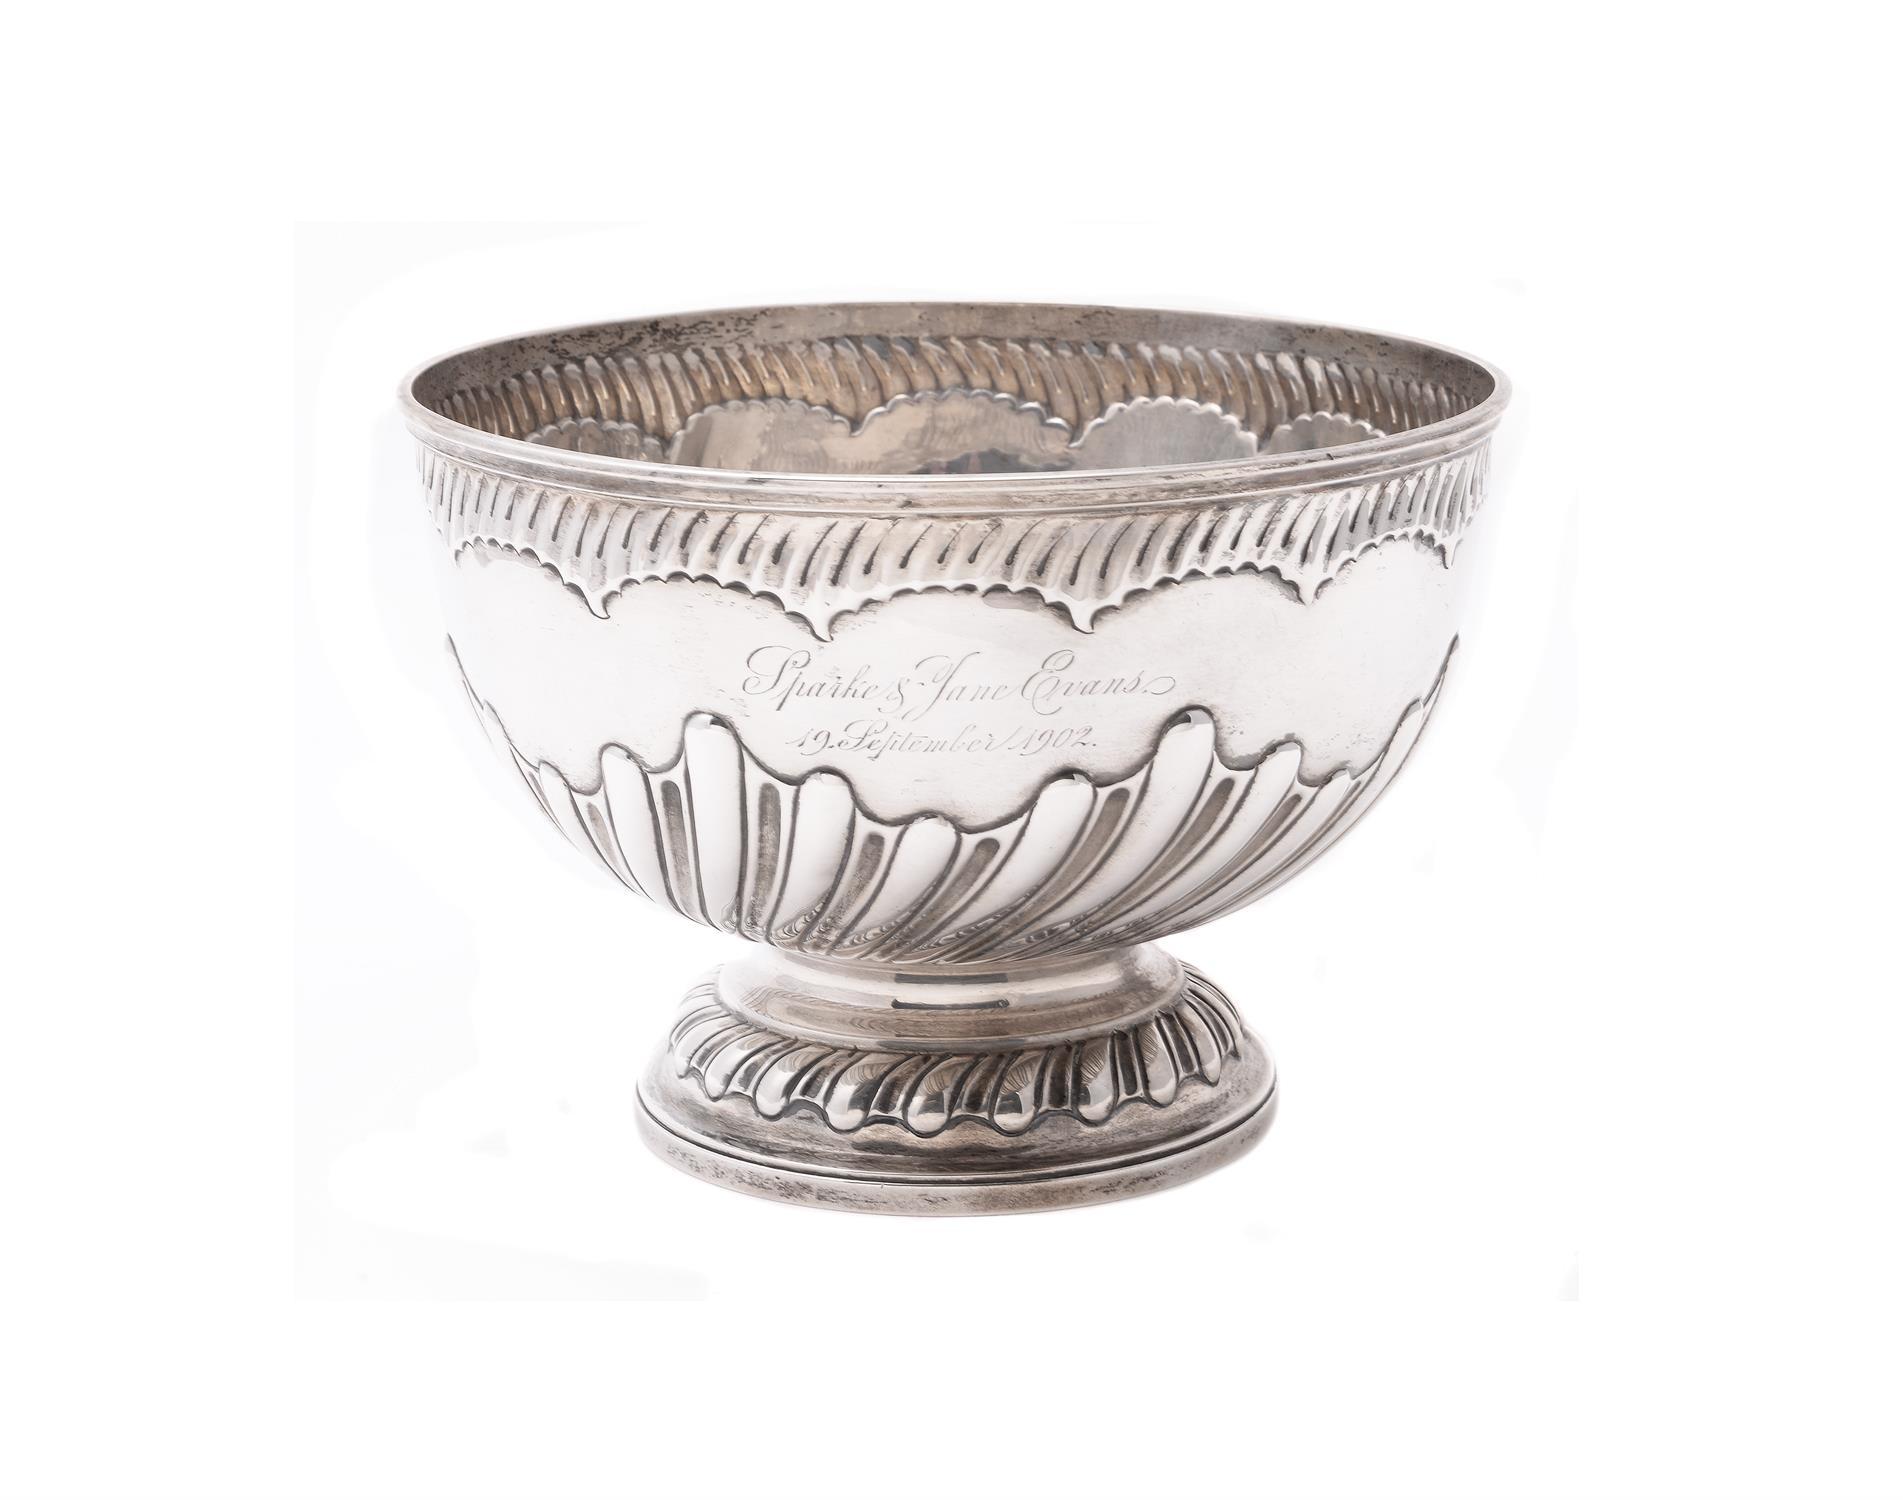 An Edwardian silver circular pedestal punch bowl